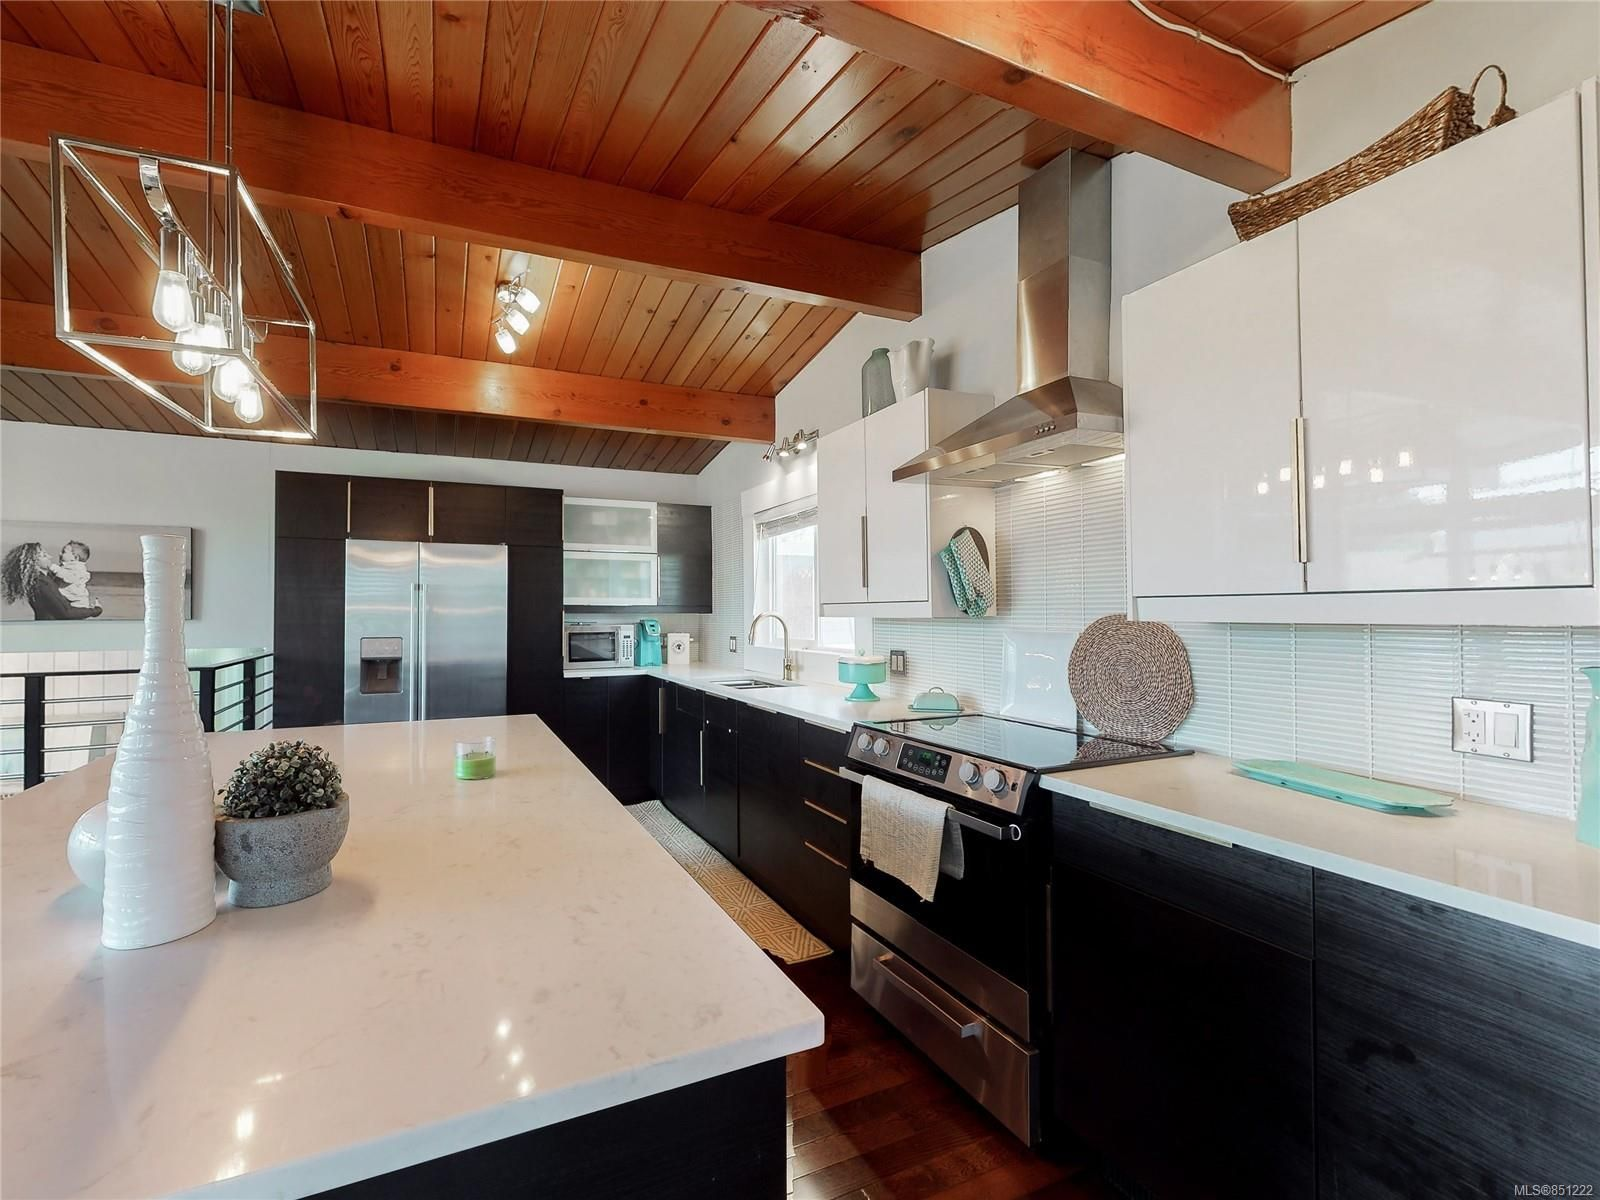 Photo 3: Photos: 2525 11th Ave in : PA Port Alberni House for sale (Port Alberni)  : MLS®# 851222